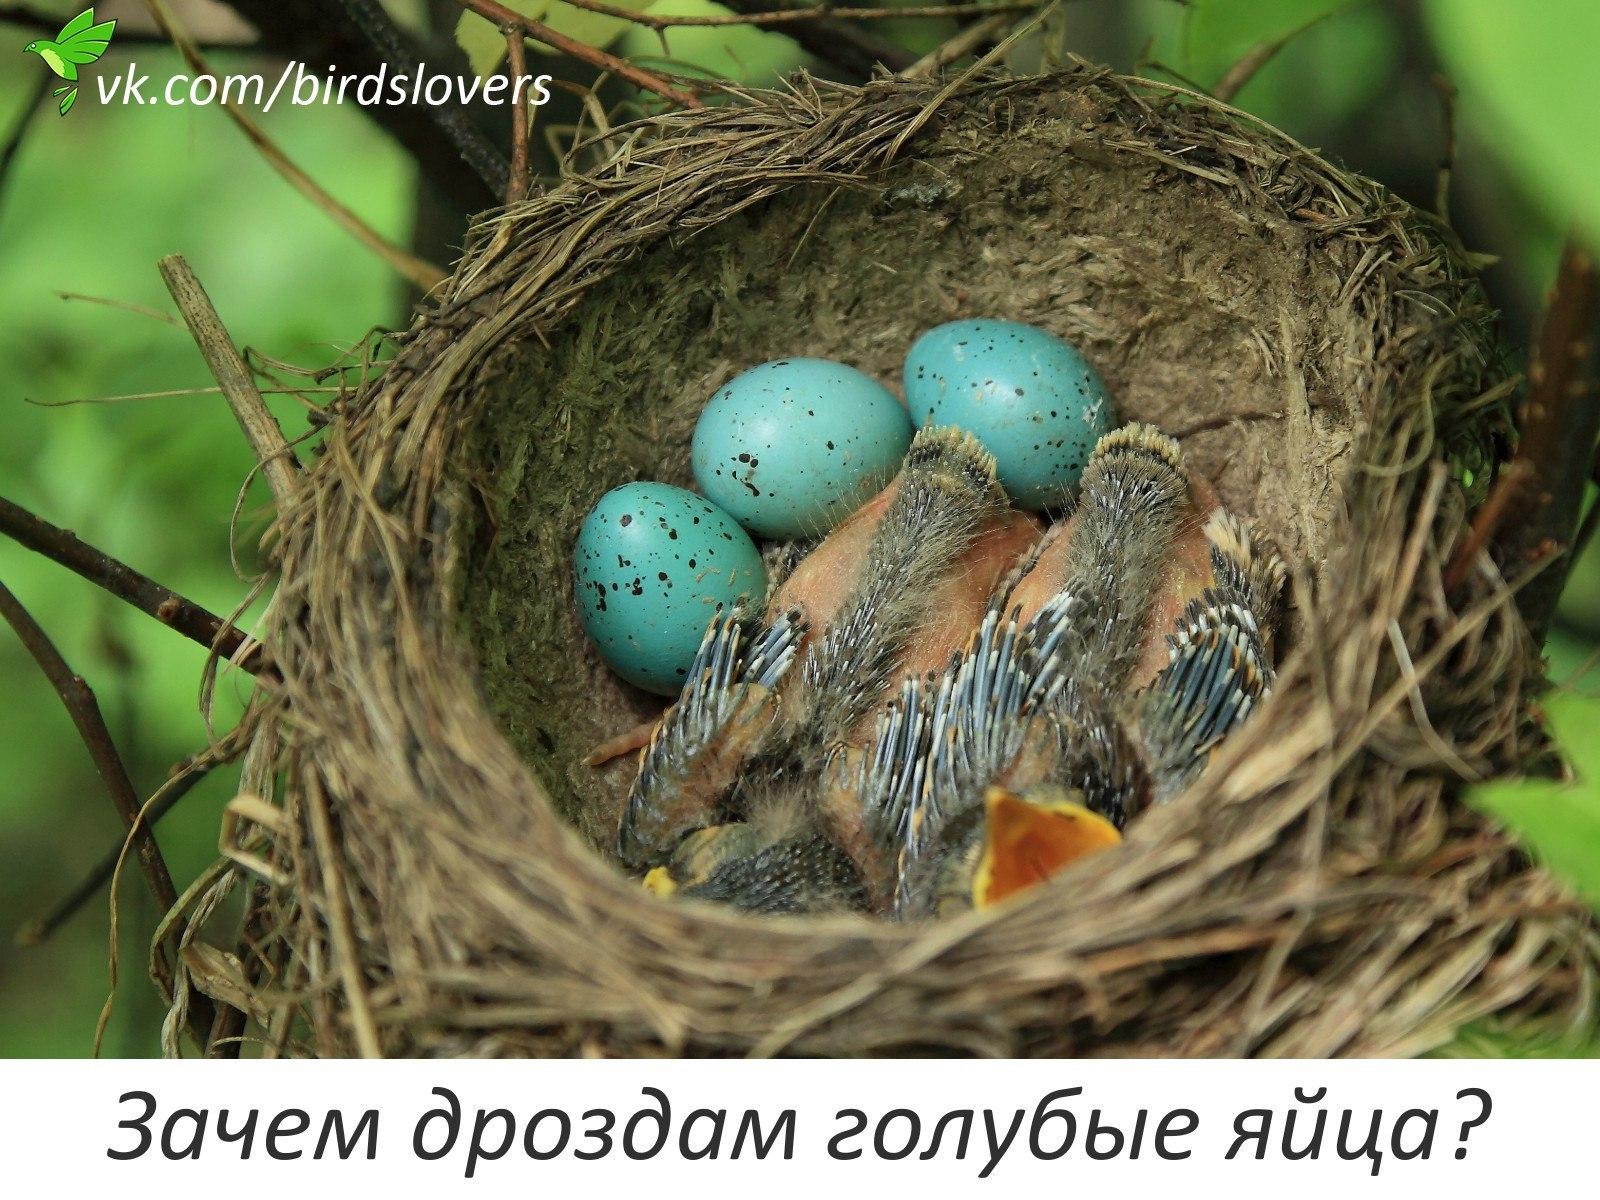 у кого из птиц голубые яйца